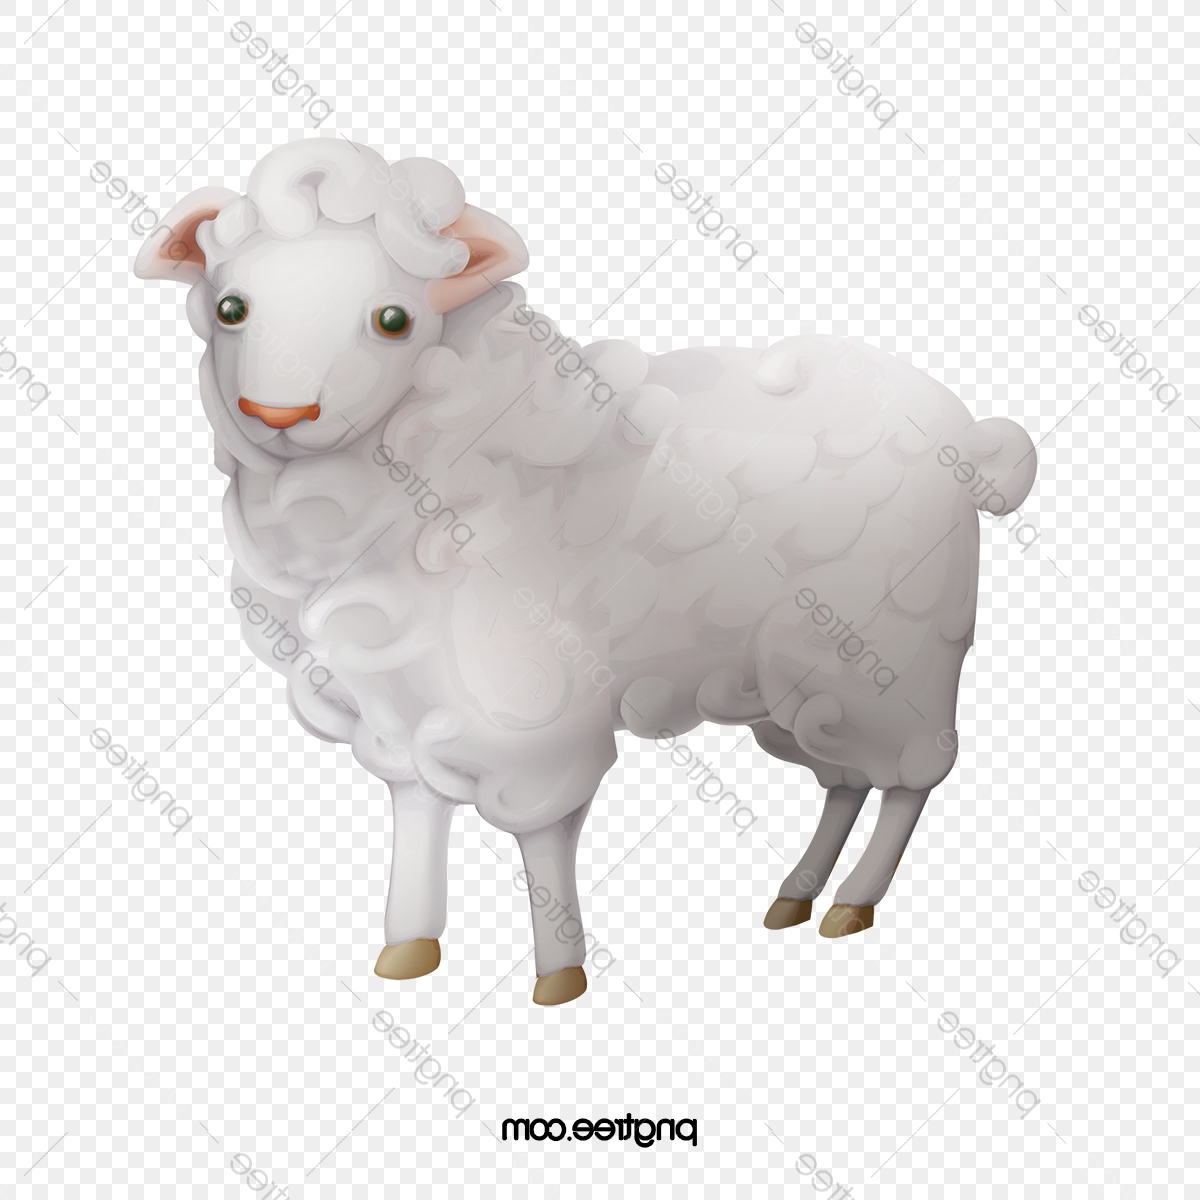 Gambar Domba Png, Vektor, Psd, Dan Clipart Dengan Latar inside Gambar Domba Png